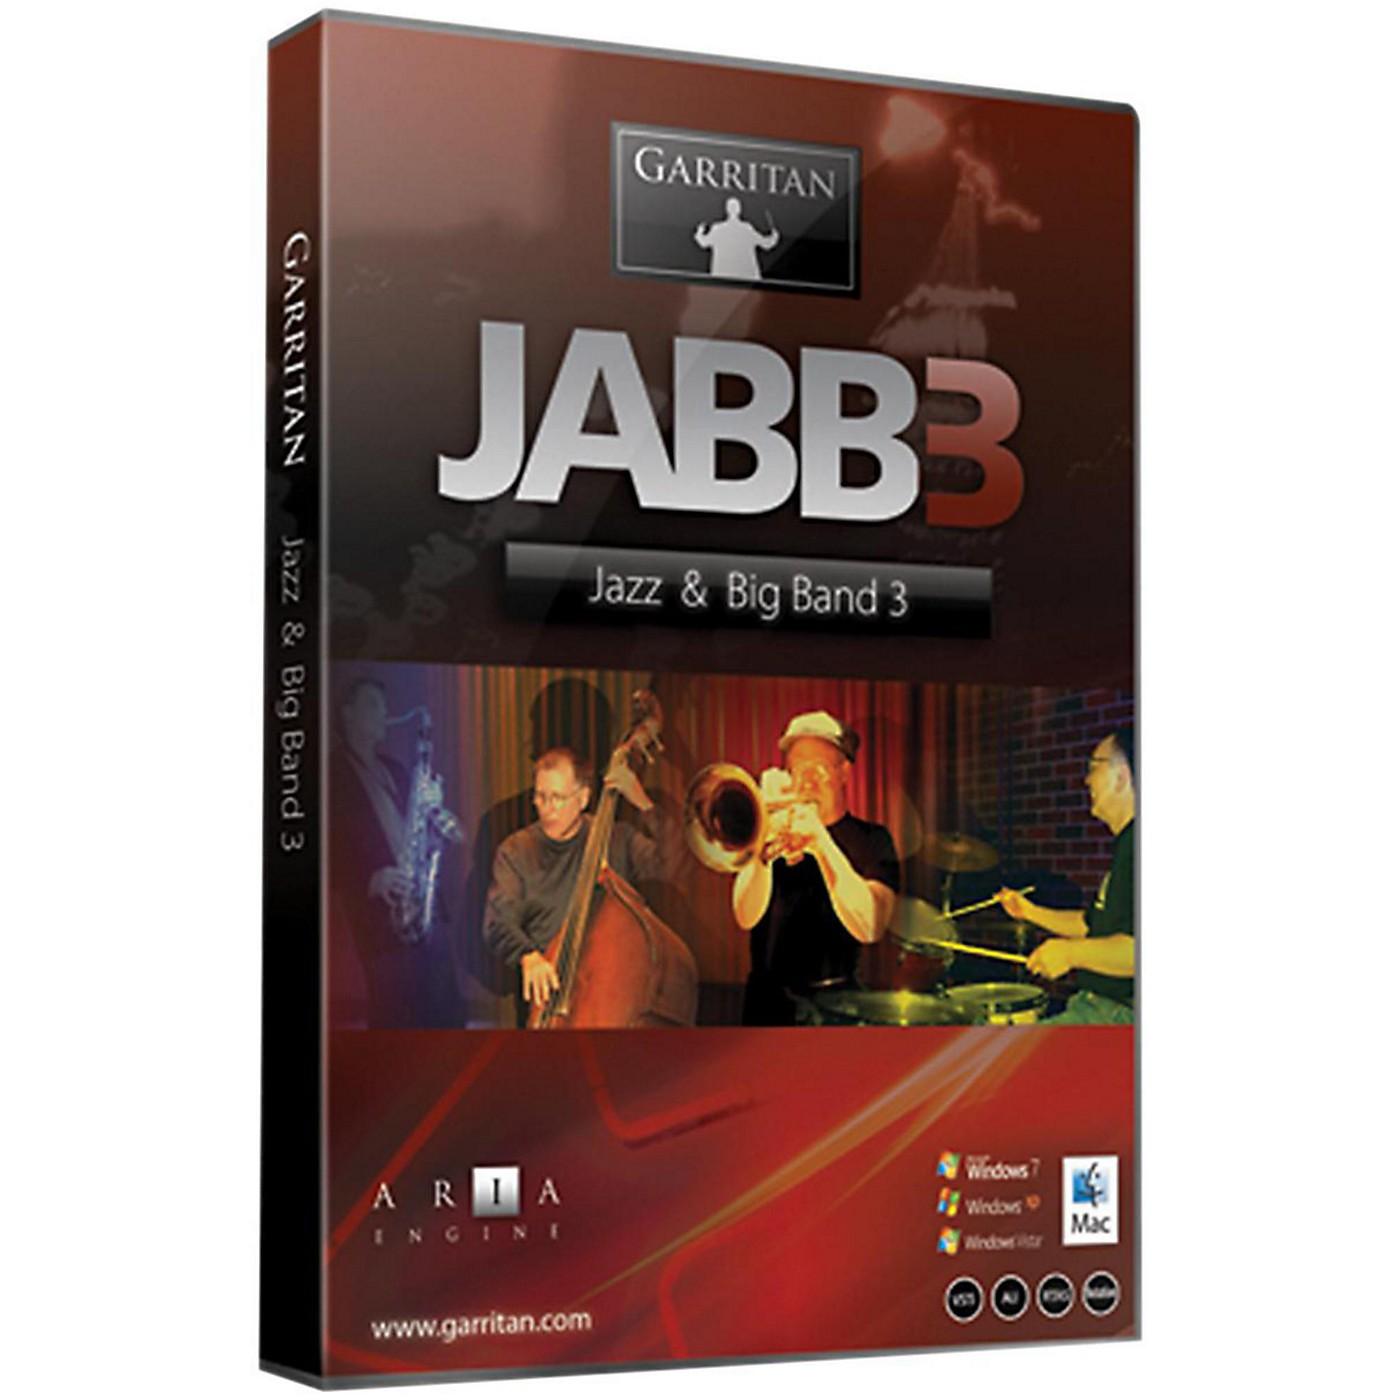 Garritan Jazz and Big Band 3 Software Download thumbnail